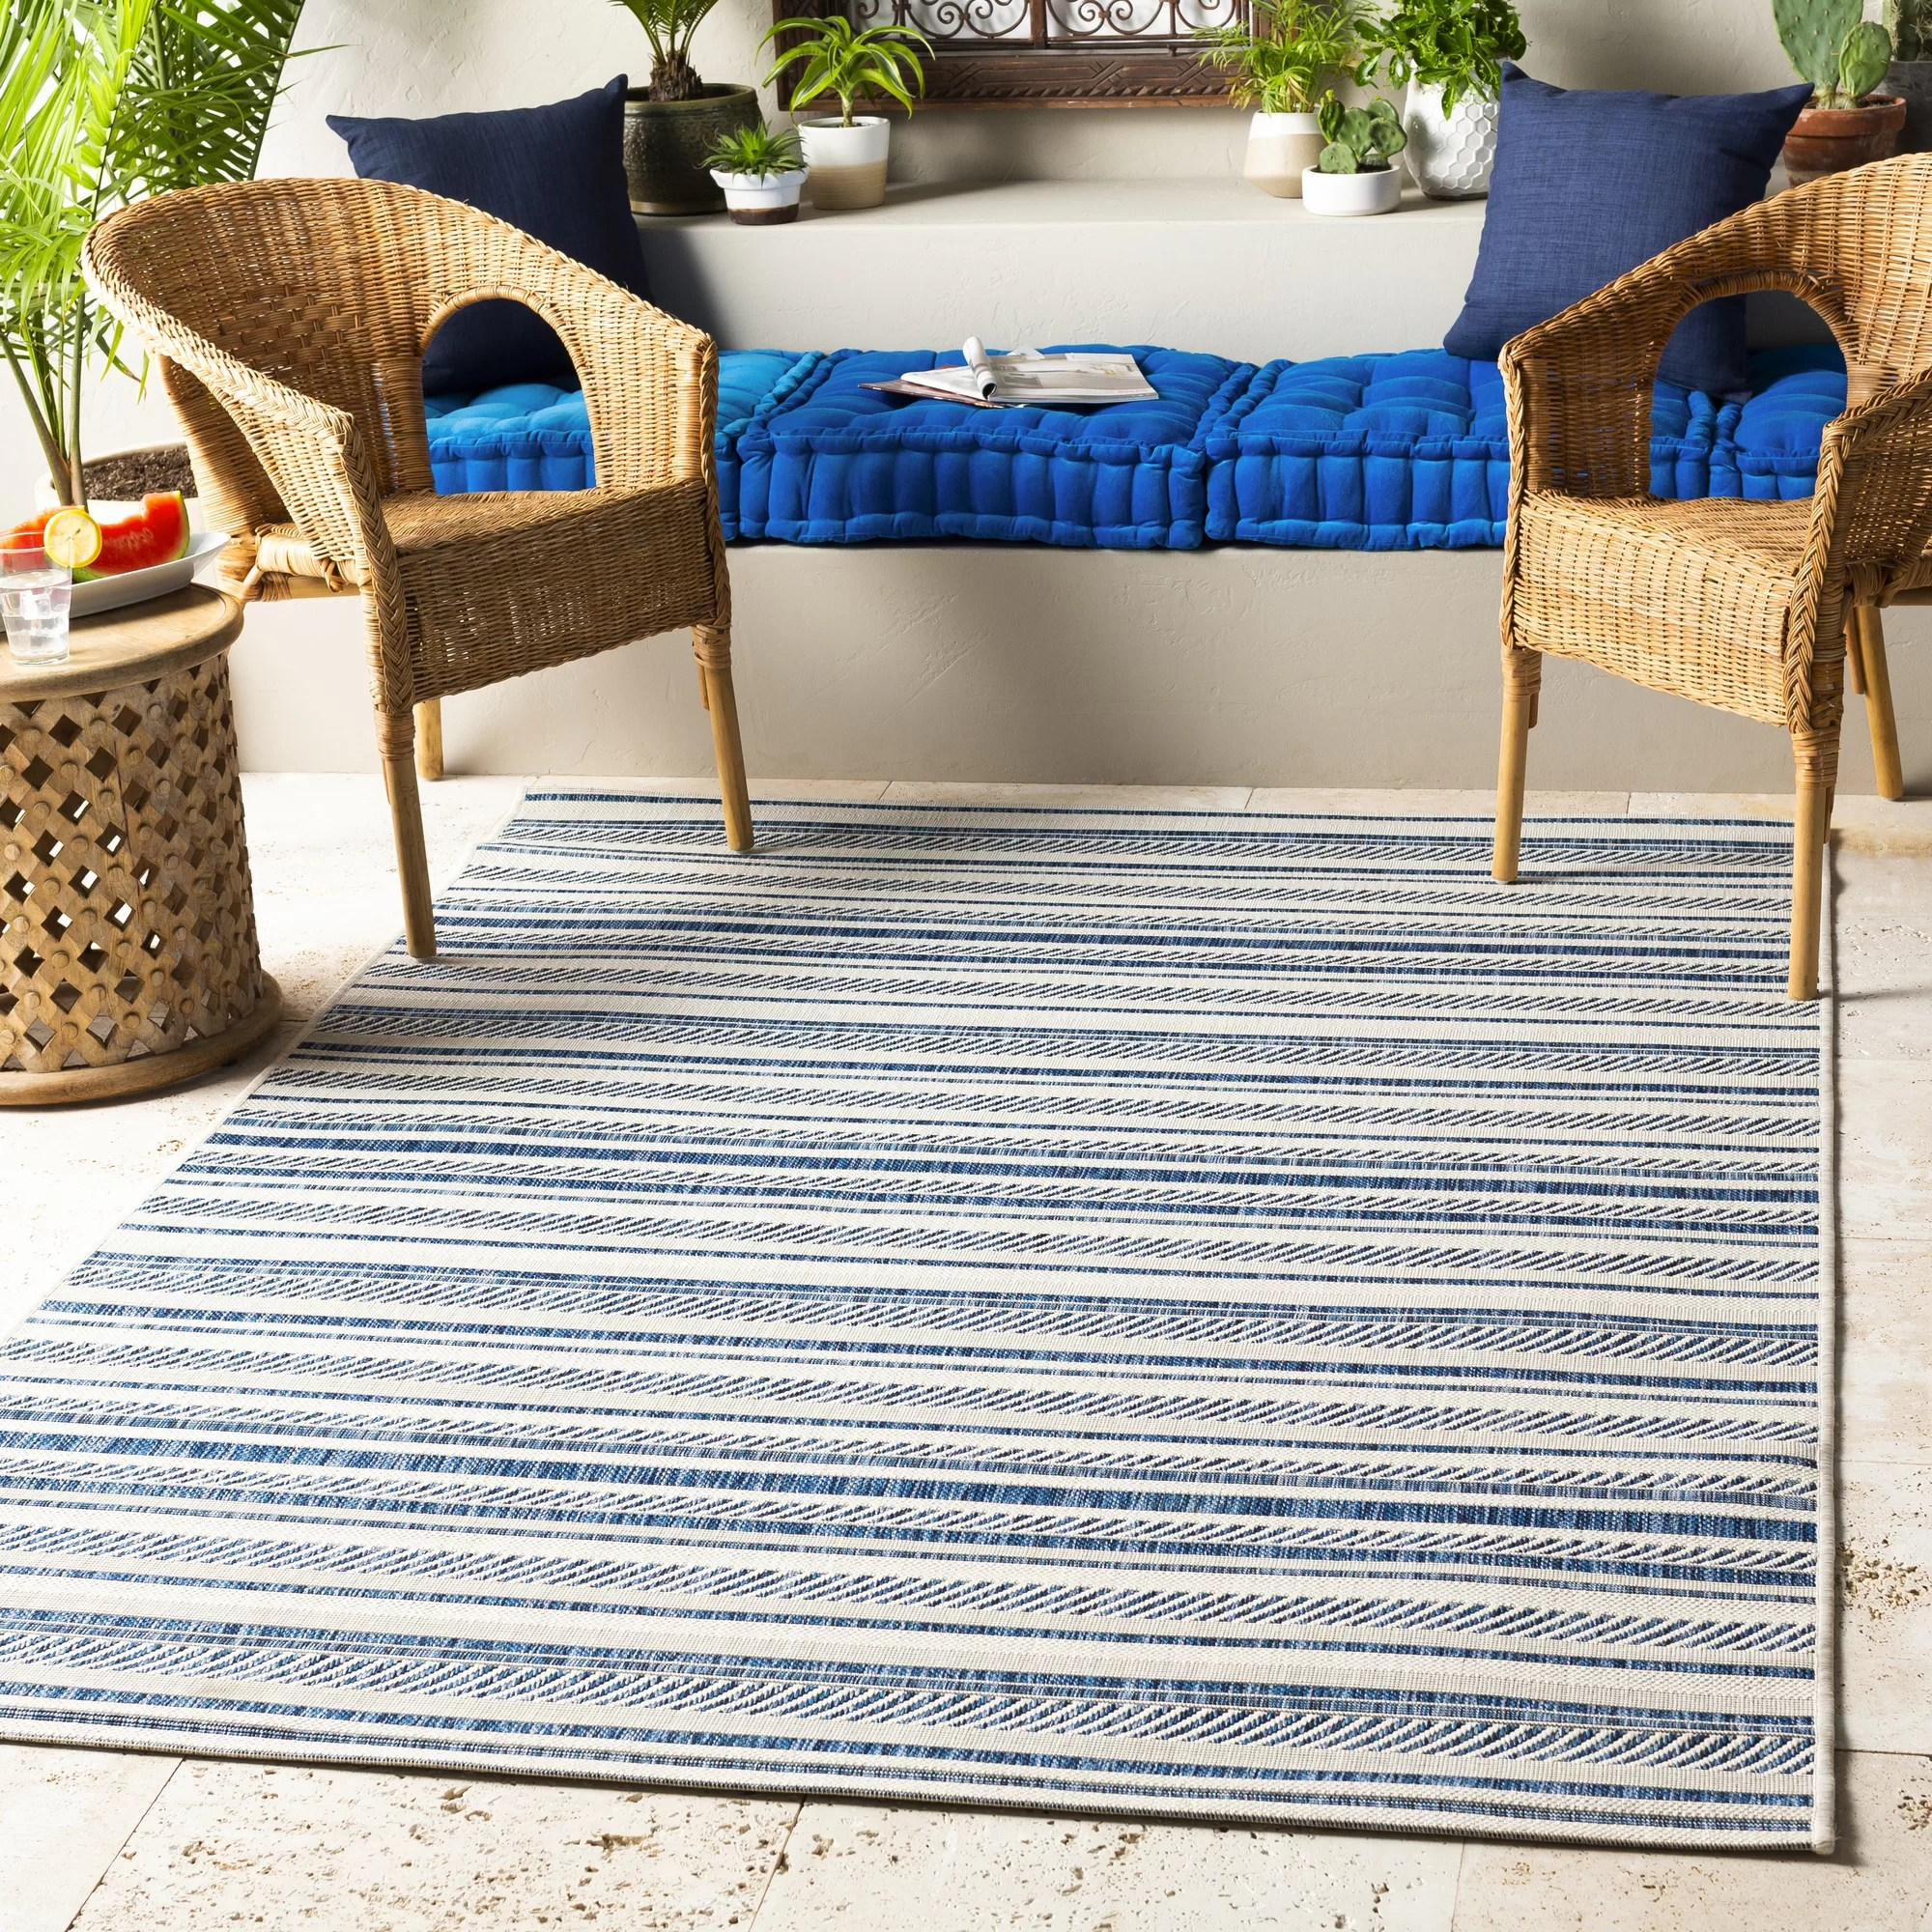 outdoor rugs you ll love in 2021 wayfair